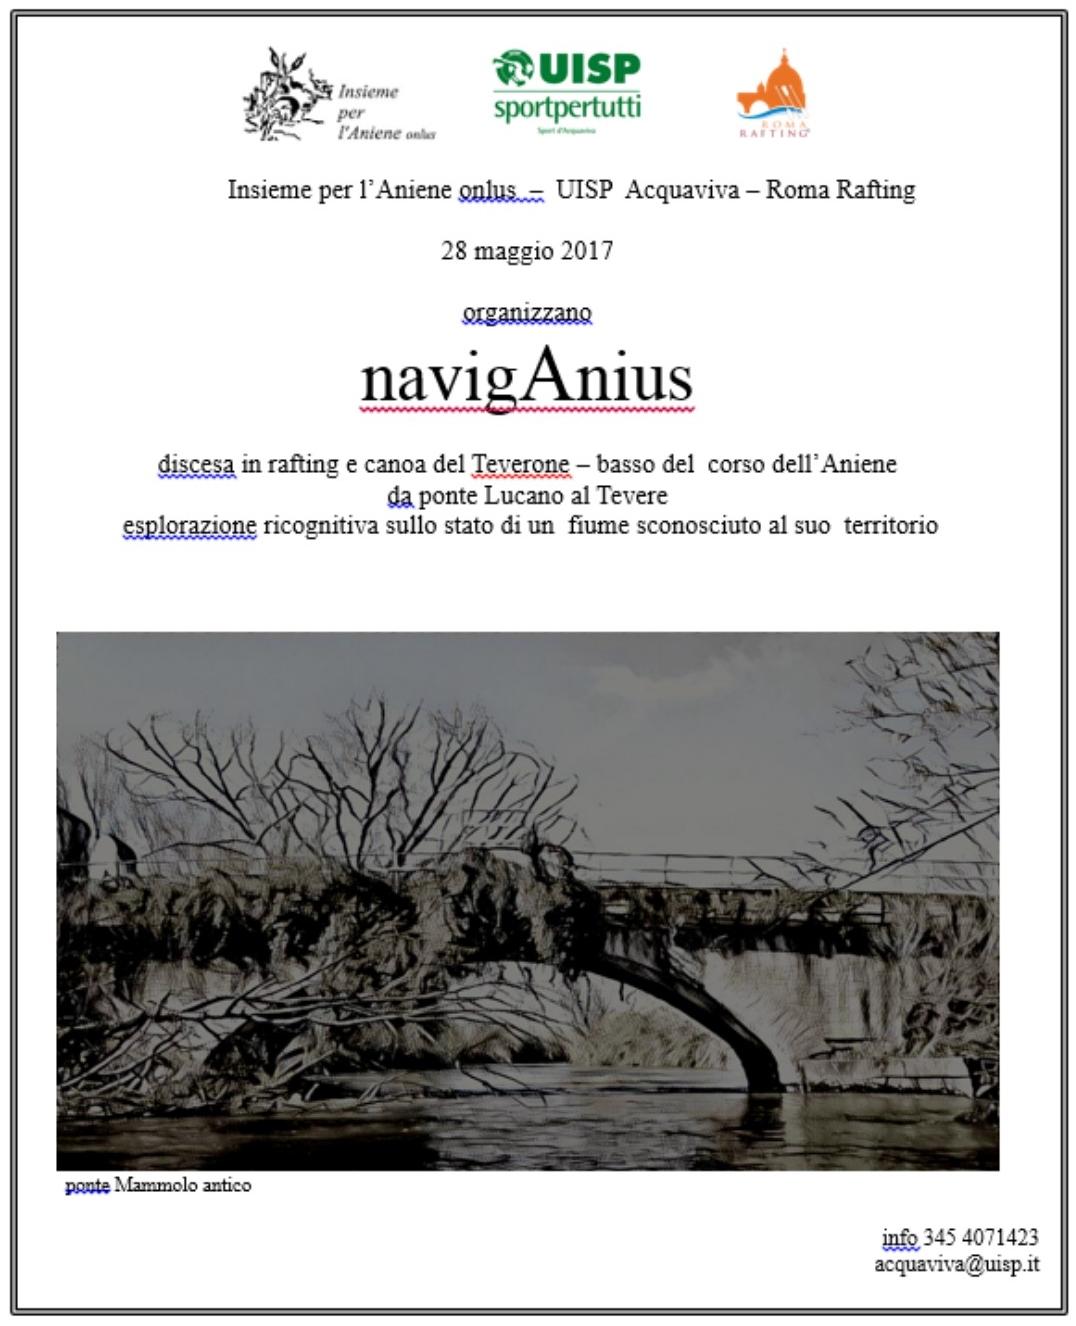 NavigAnius - discesa in rafting e canoa del Teverone